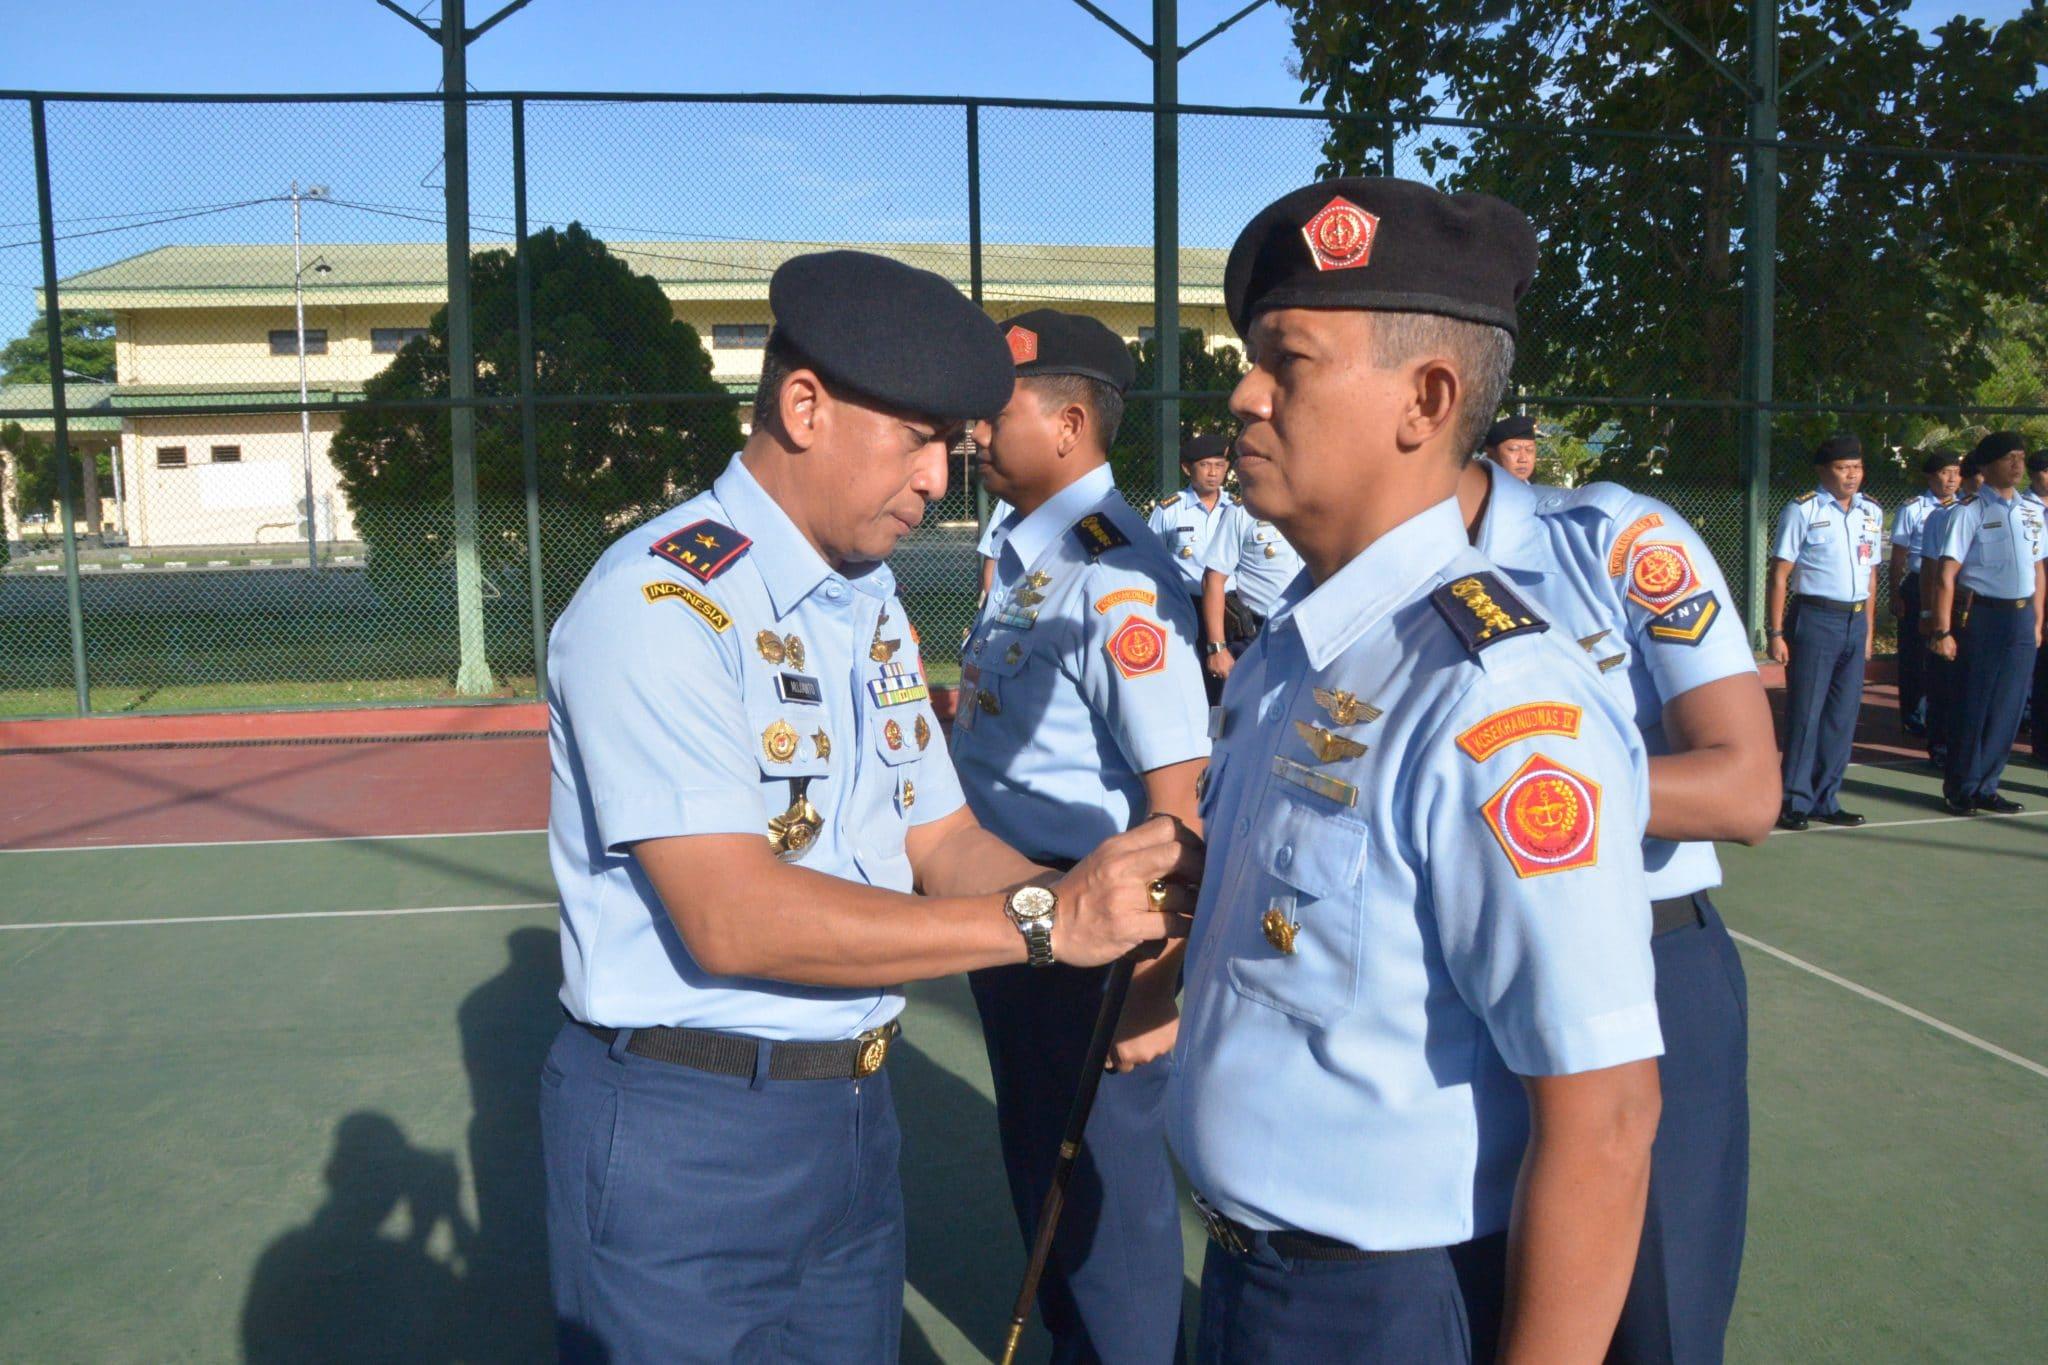 Kolonel Adm Imam Supangat Jabat Aspers Kosekhanudnas IV